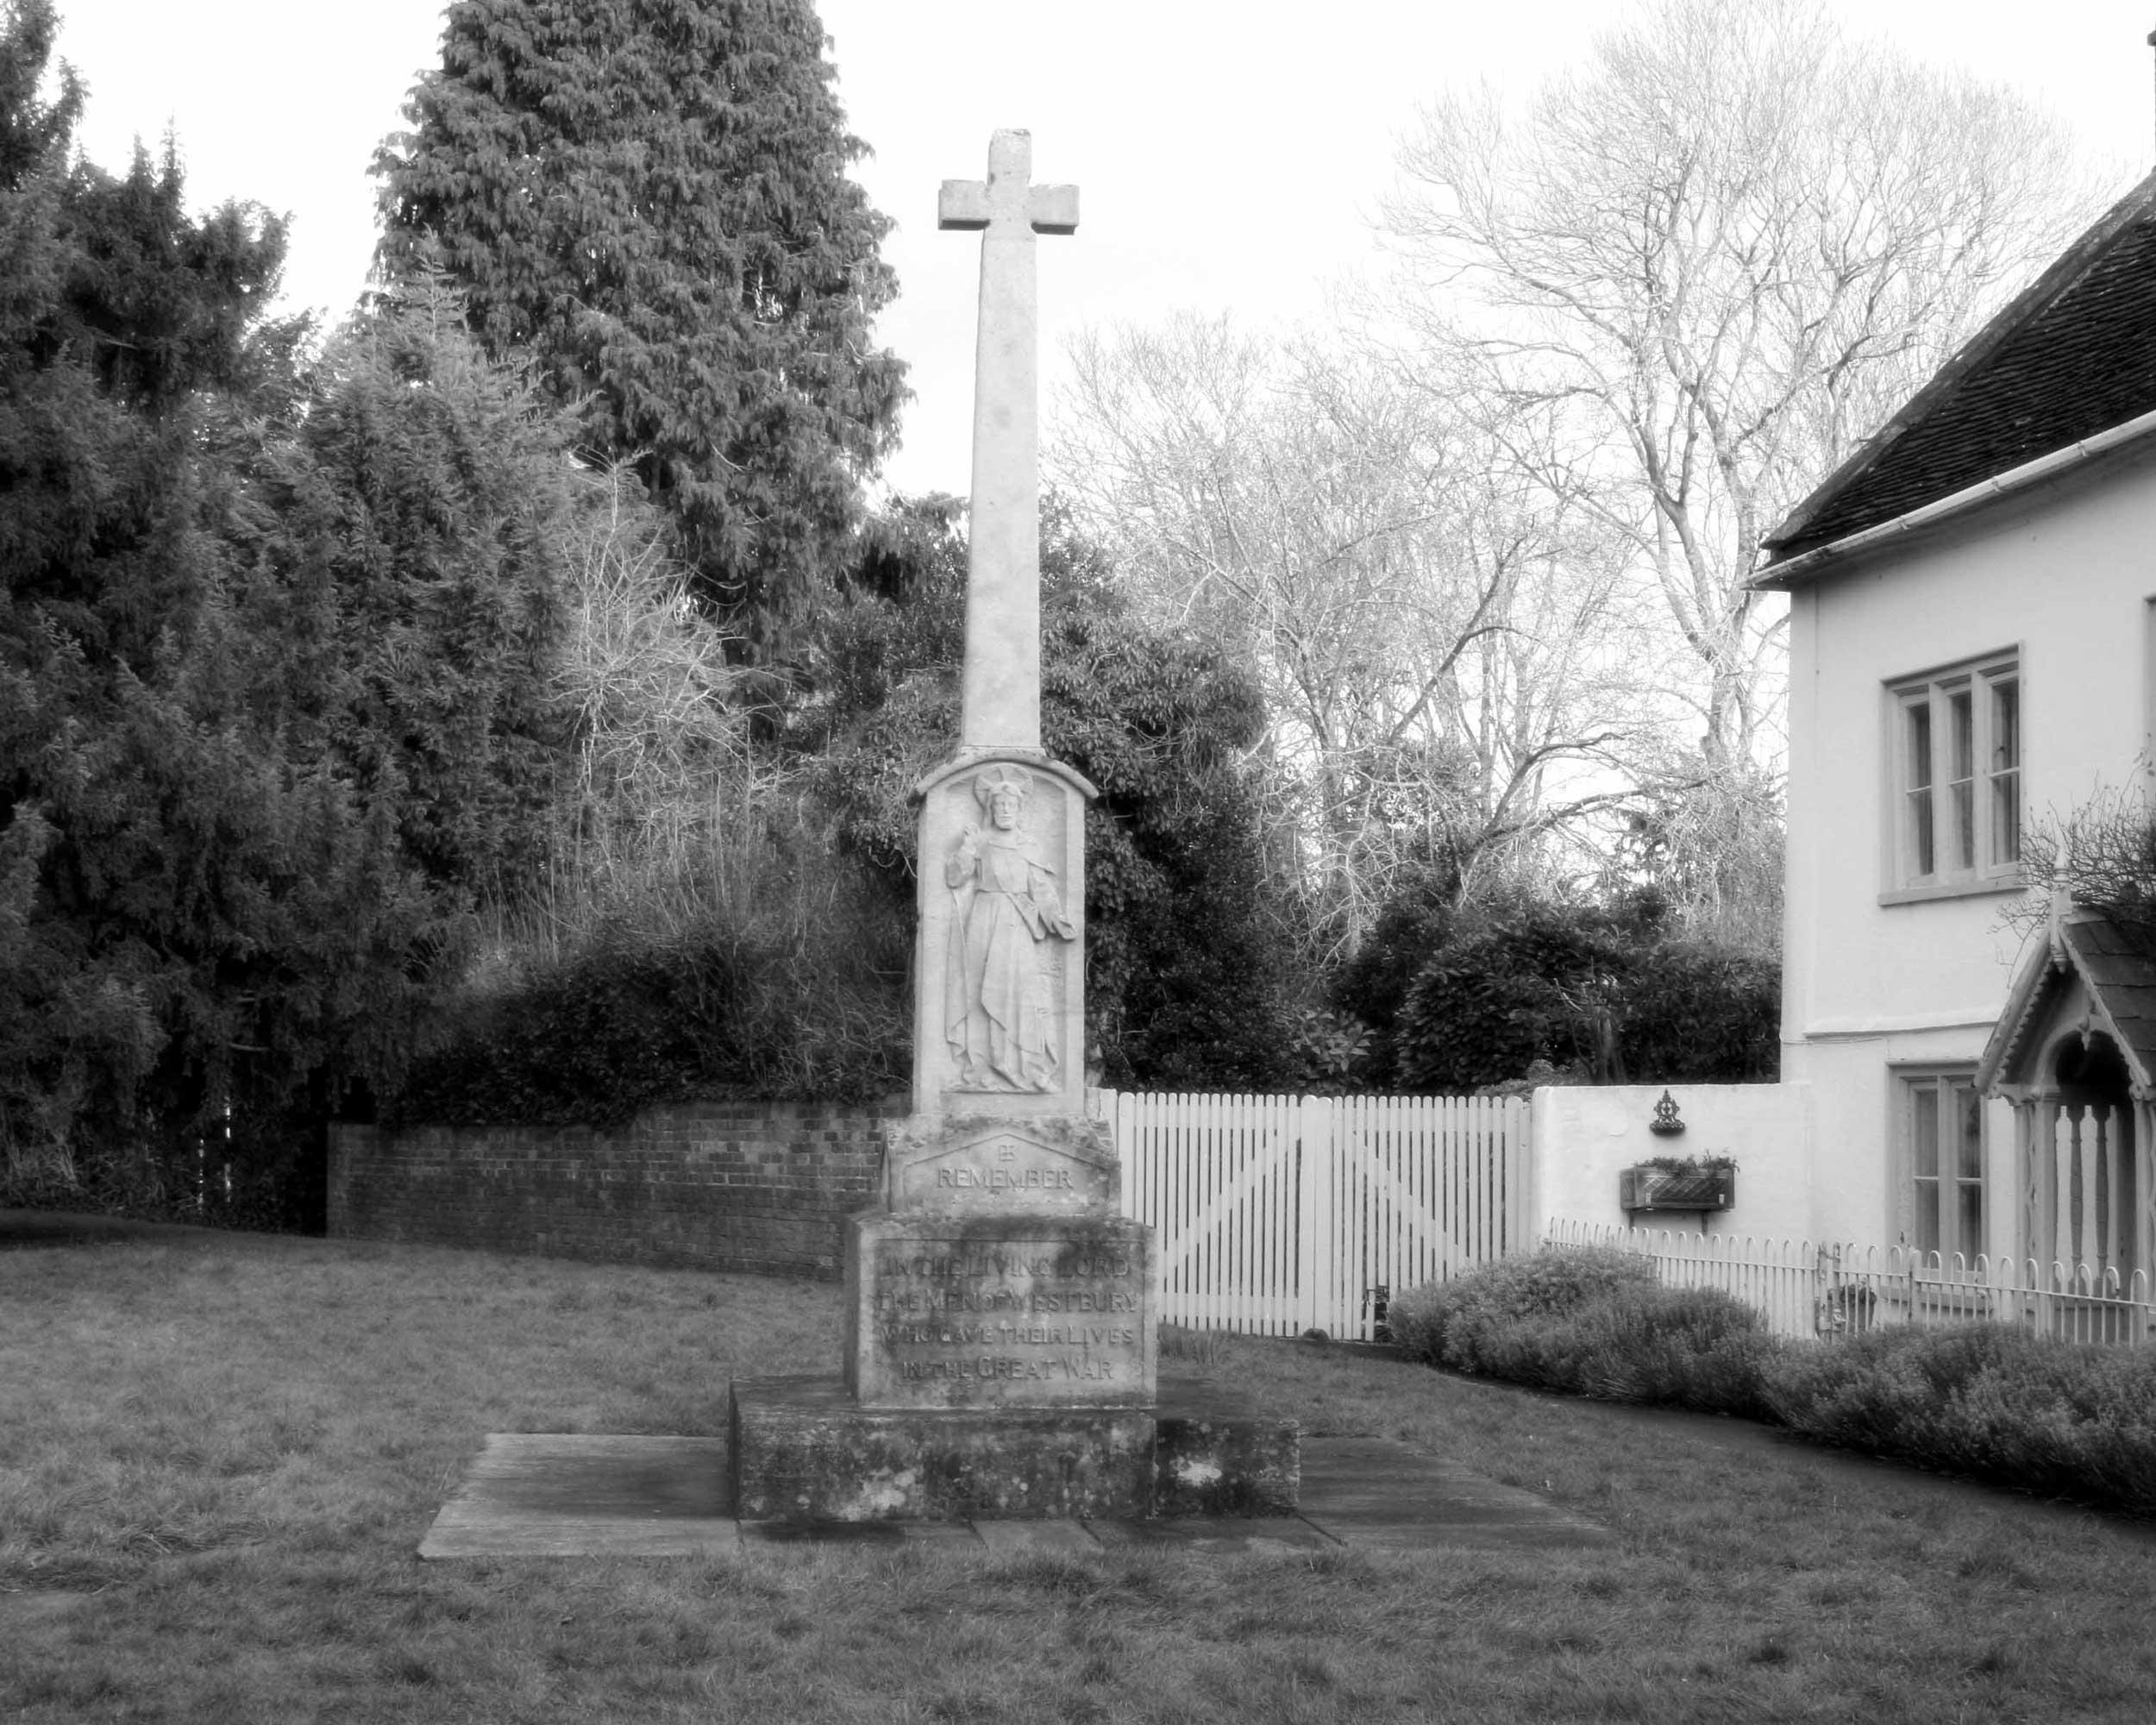 whs_memorial - War Memorials